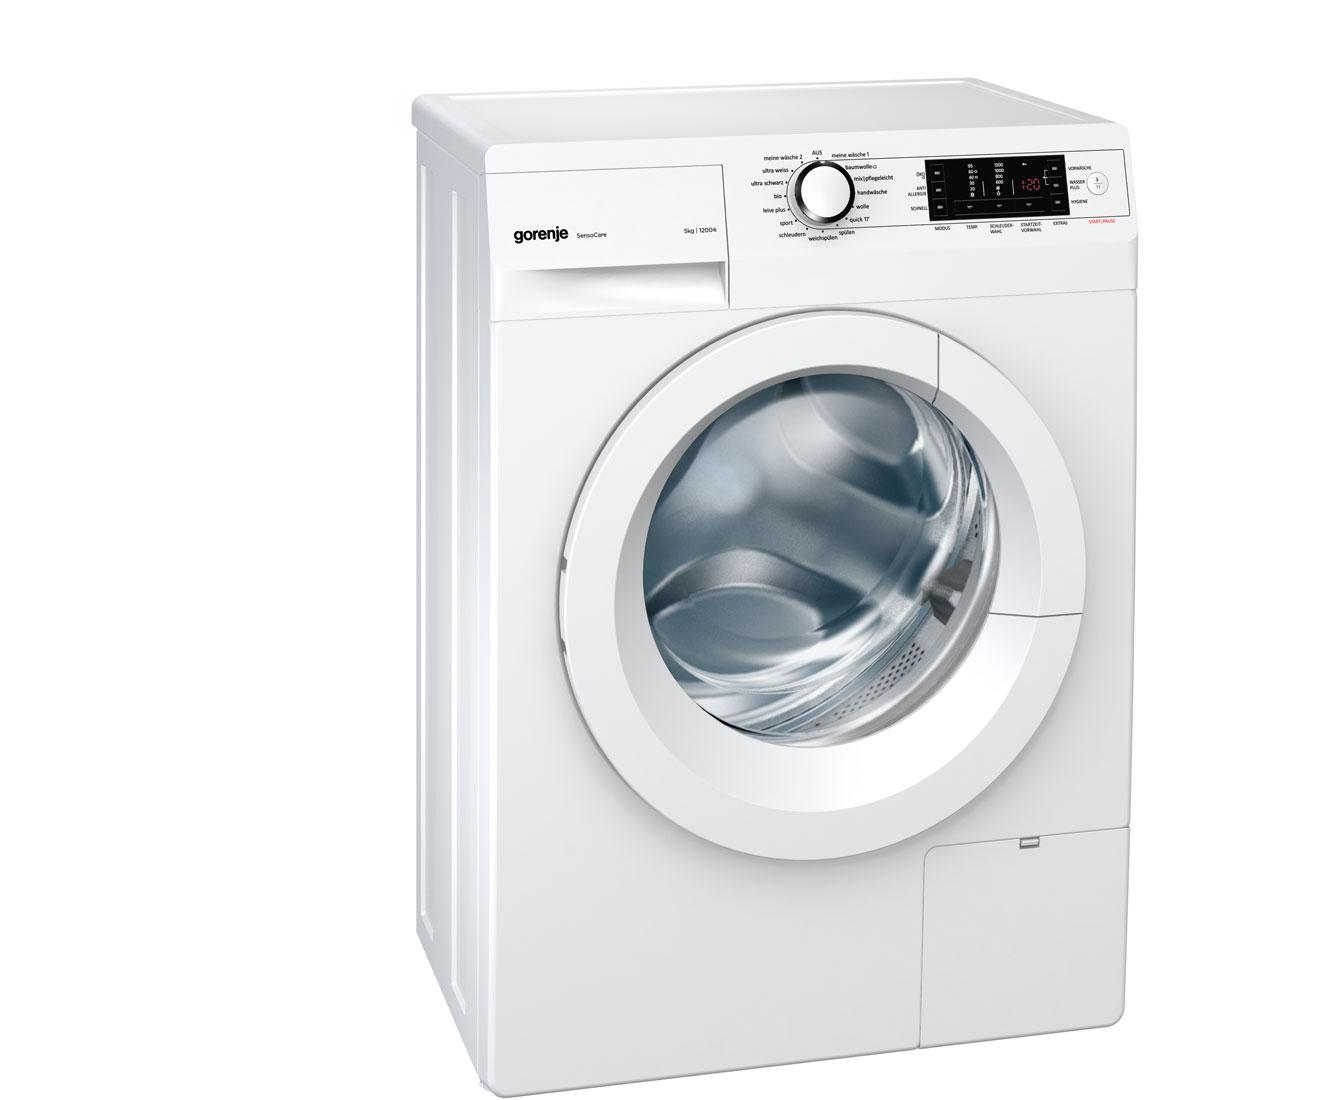 http://media.ao.com/produktbild/gro%C3%9F/w5523s_wh_gorenje_waschmaschine_fr_l.jpg